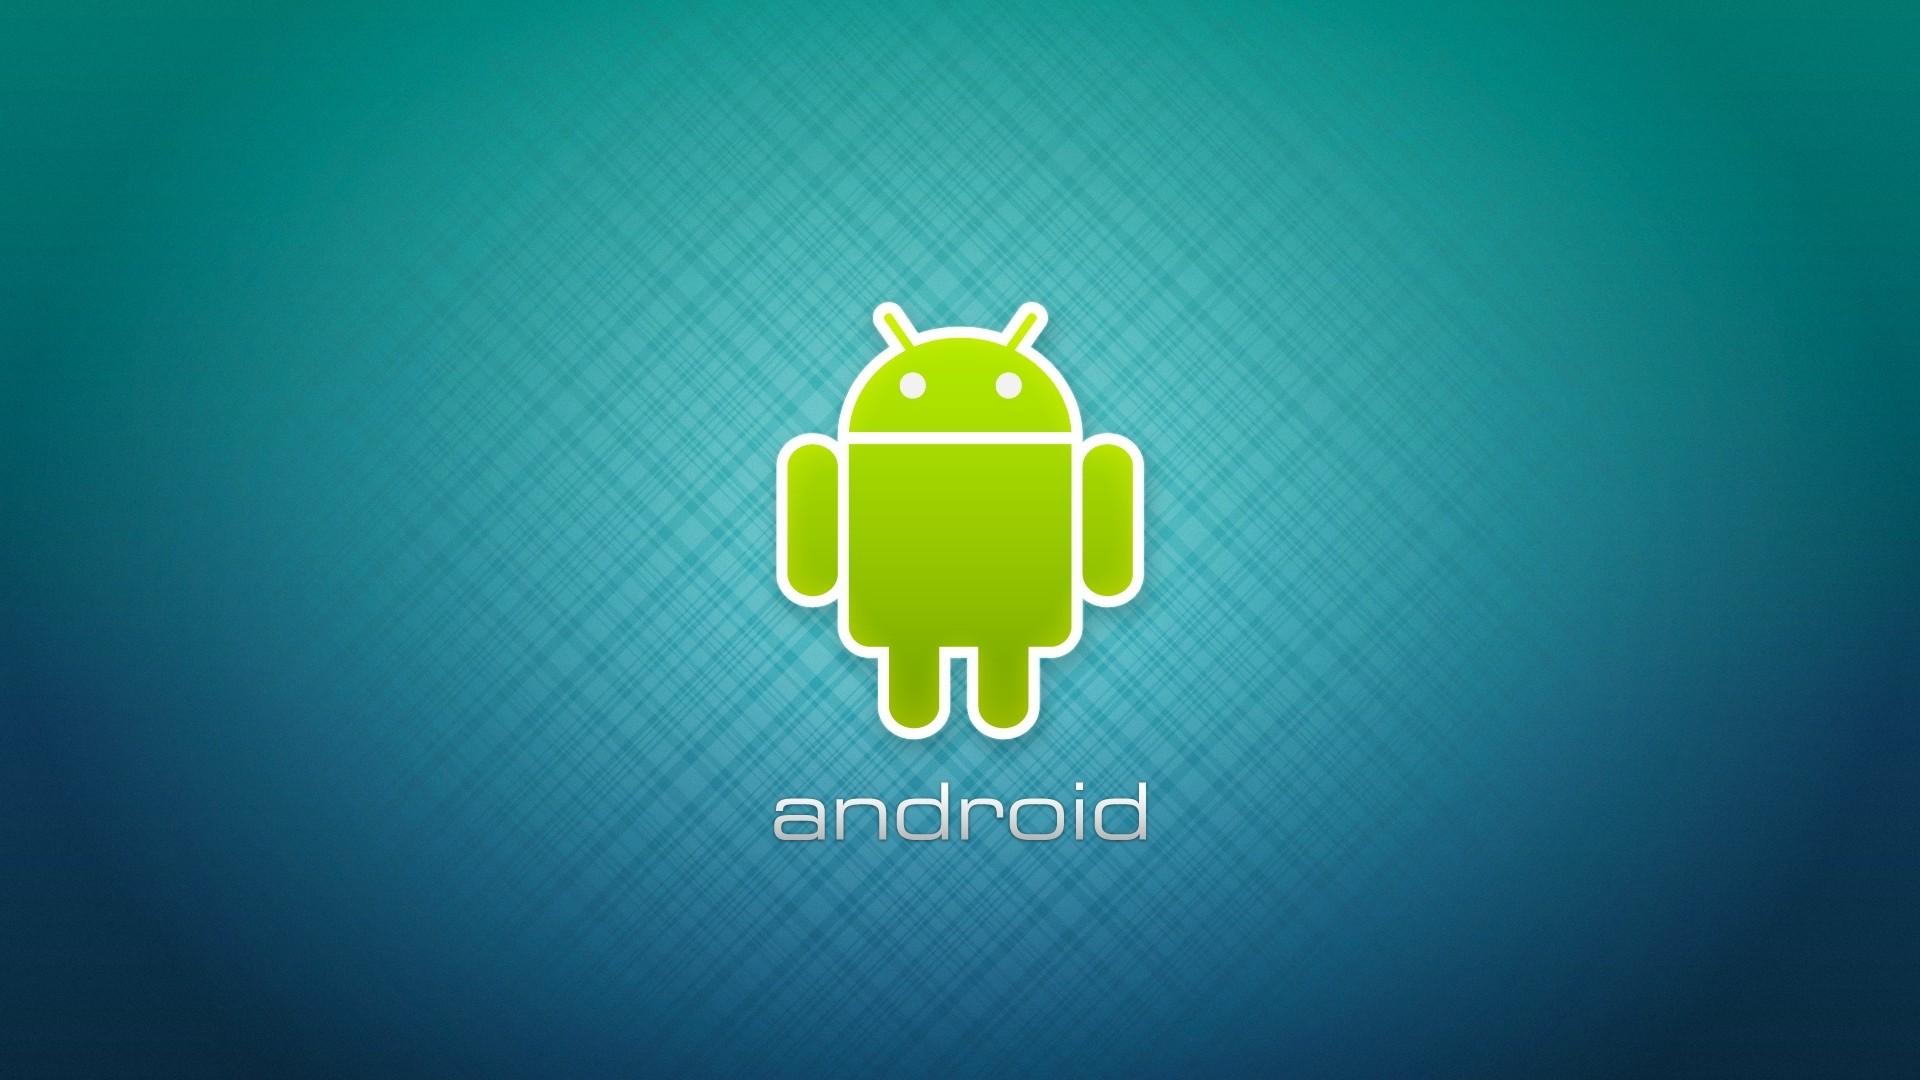 fantastic android logo wallpaper 43634